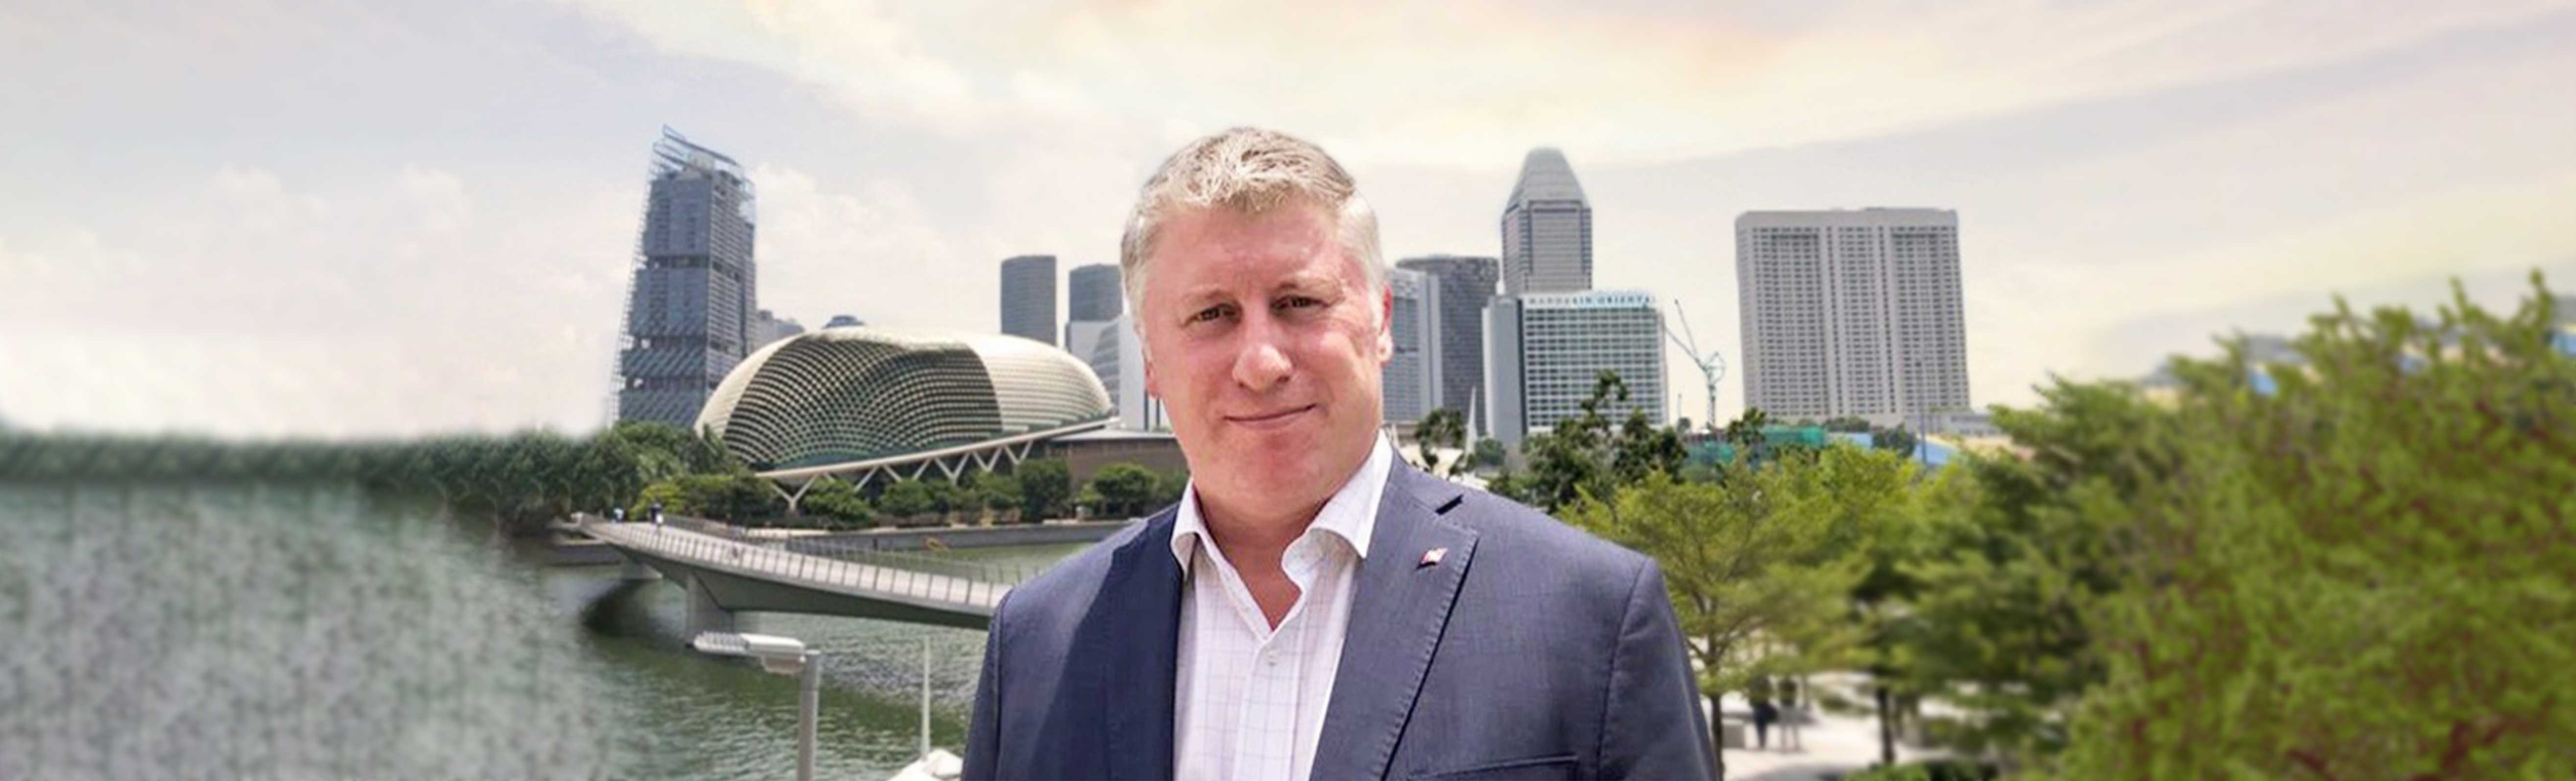 TAG航空亞洲區商務總監 Simon Bambridge 遷往新加坡 開發東南亞市場